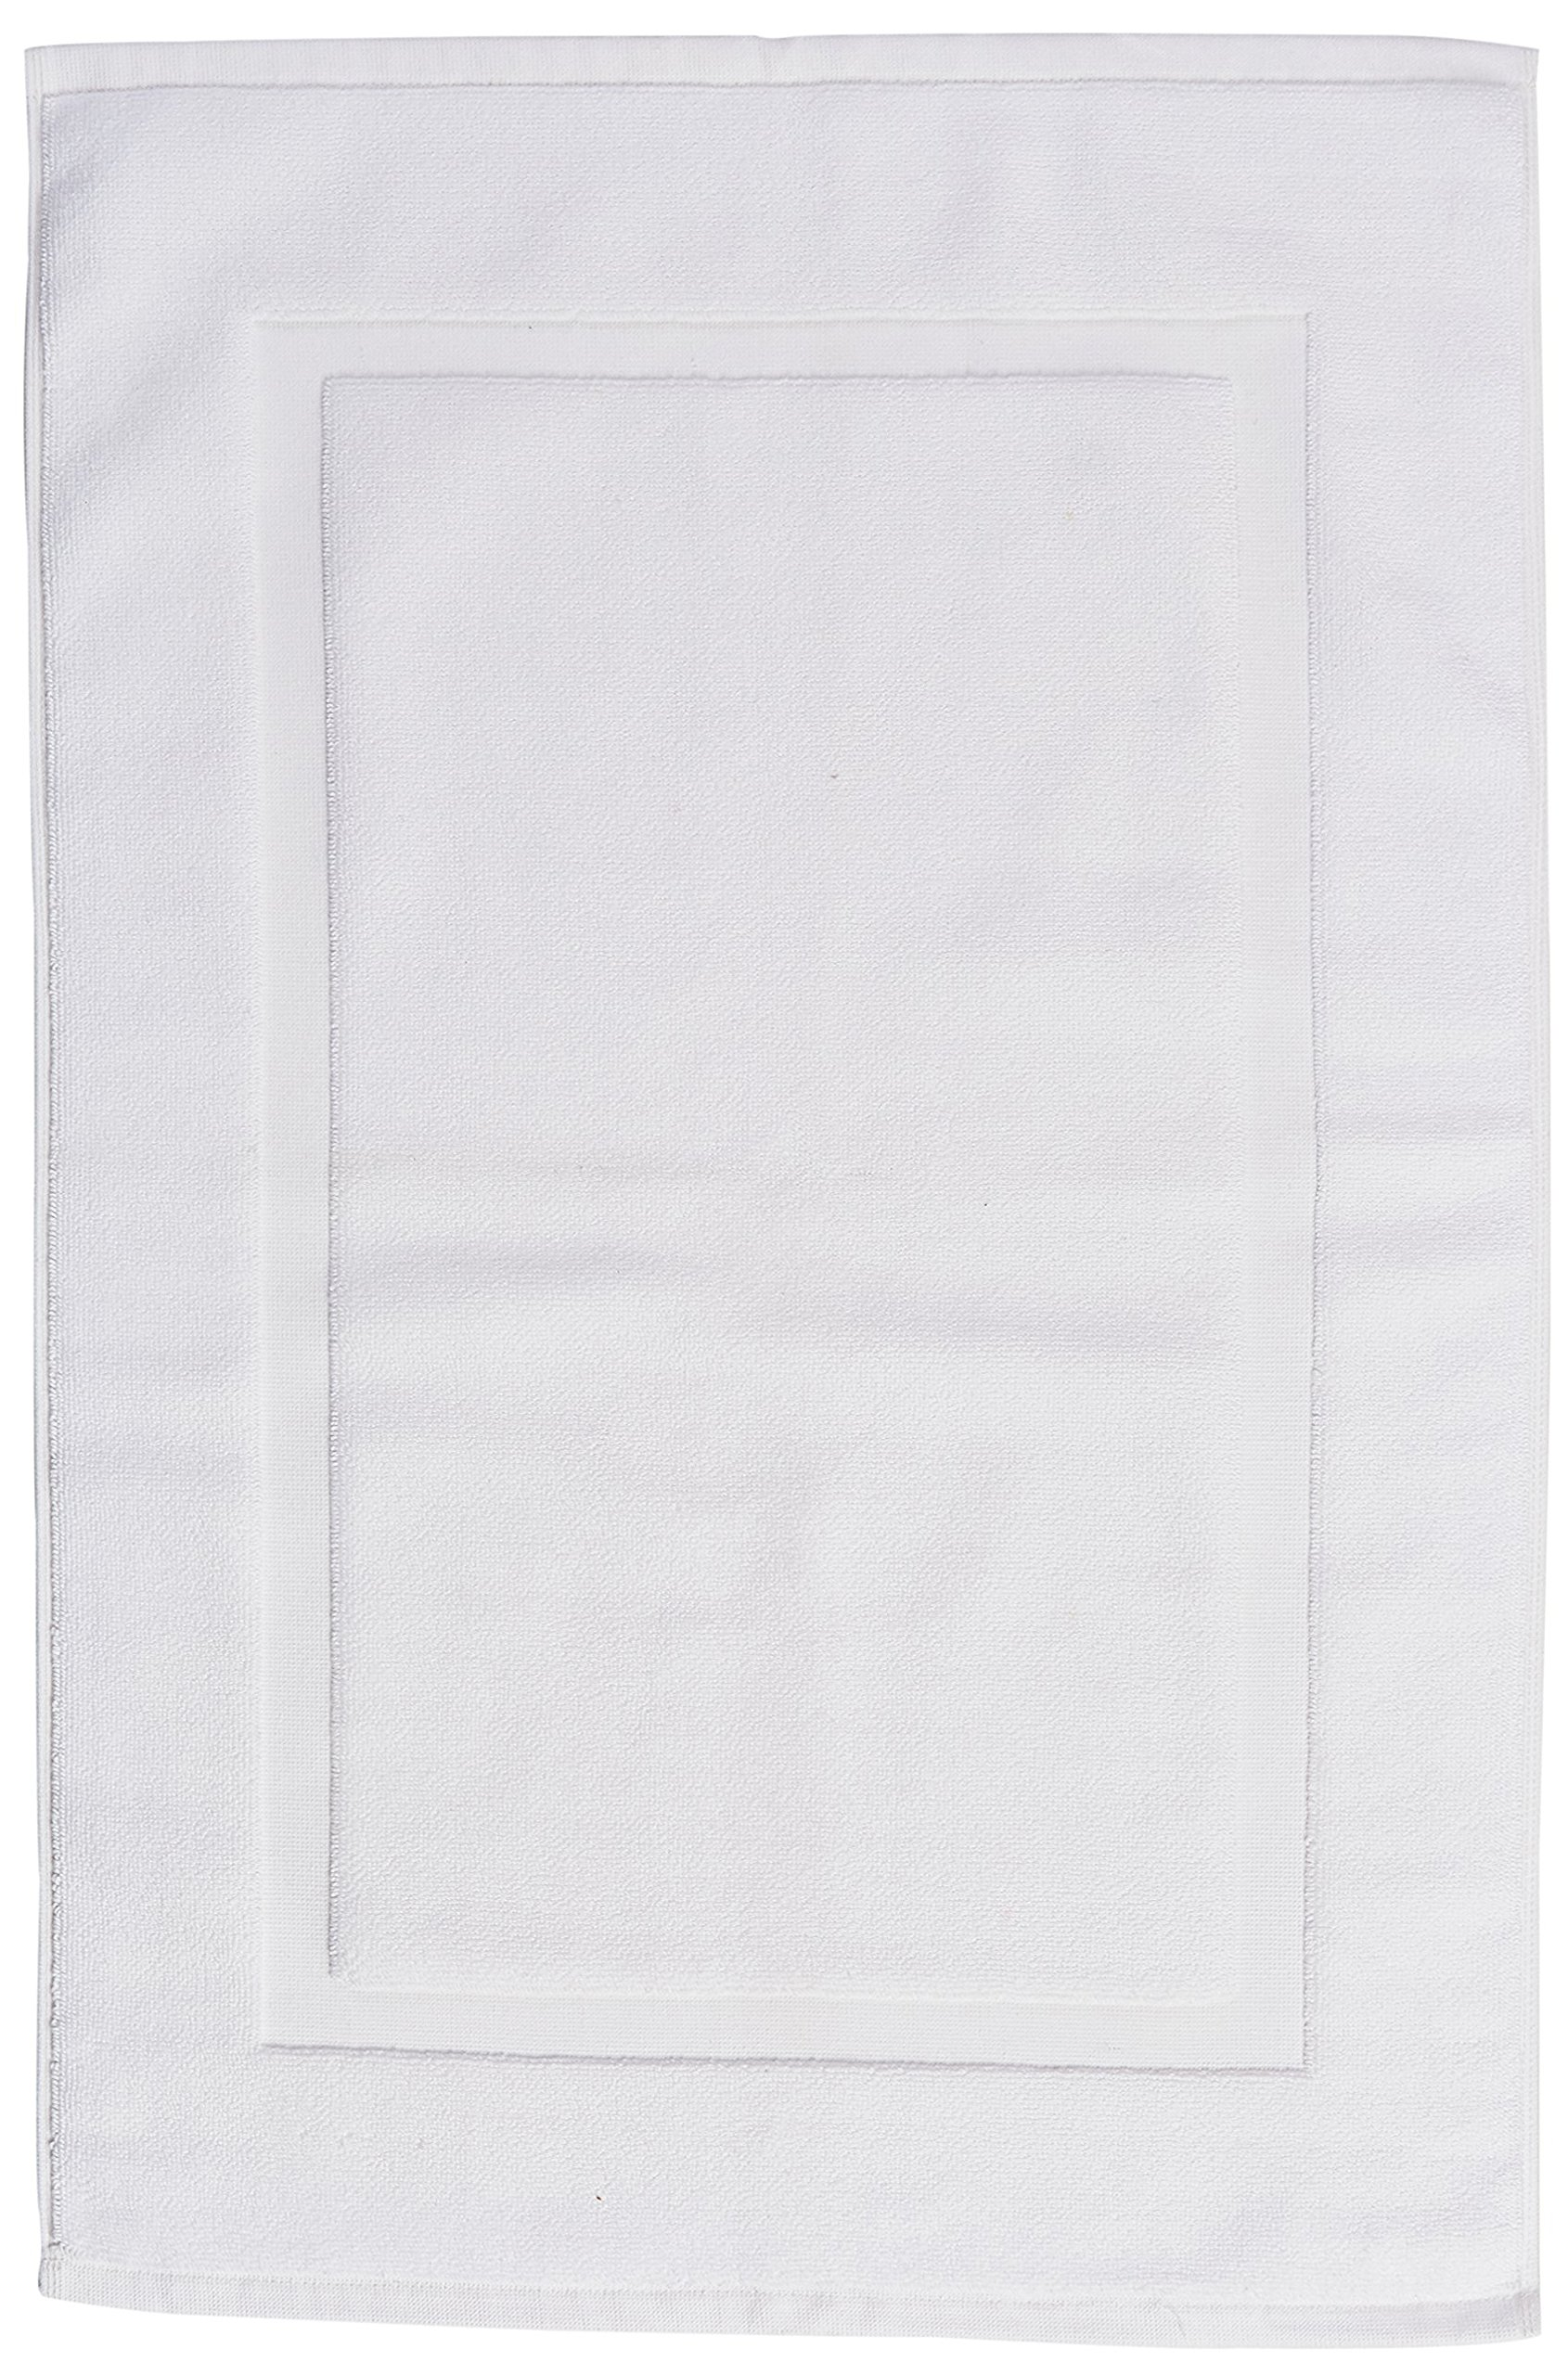 AmazonBasics Banded Bath Mat, 20 x 31 inch, White,4-Pack